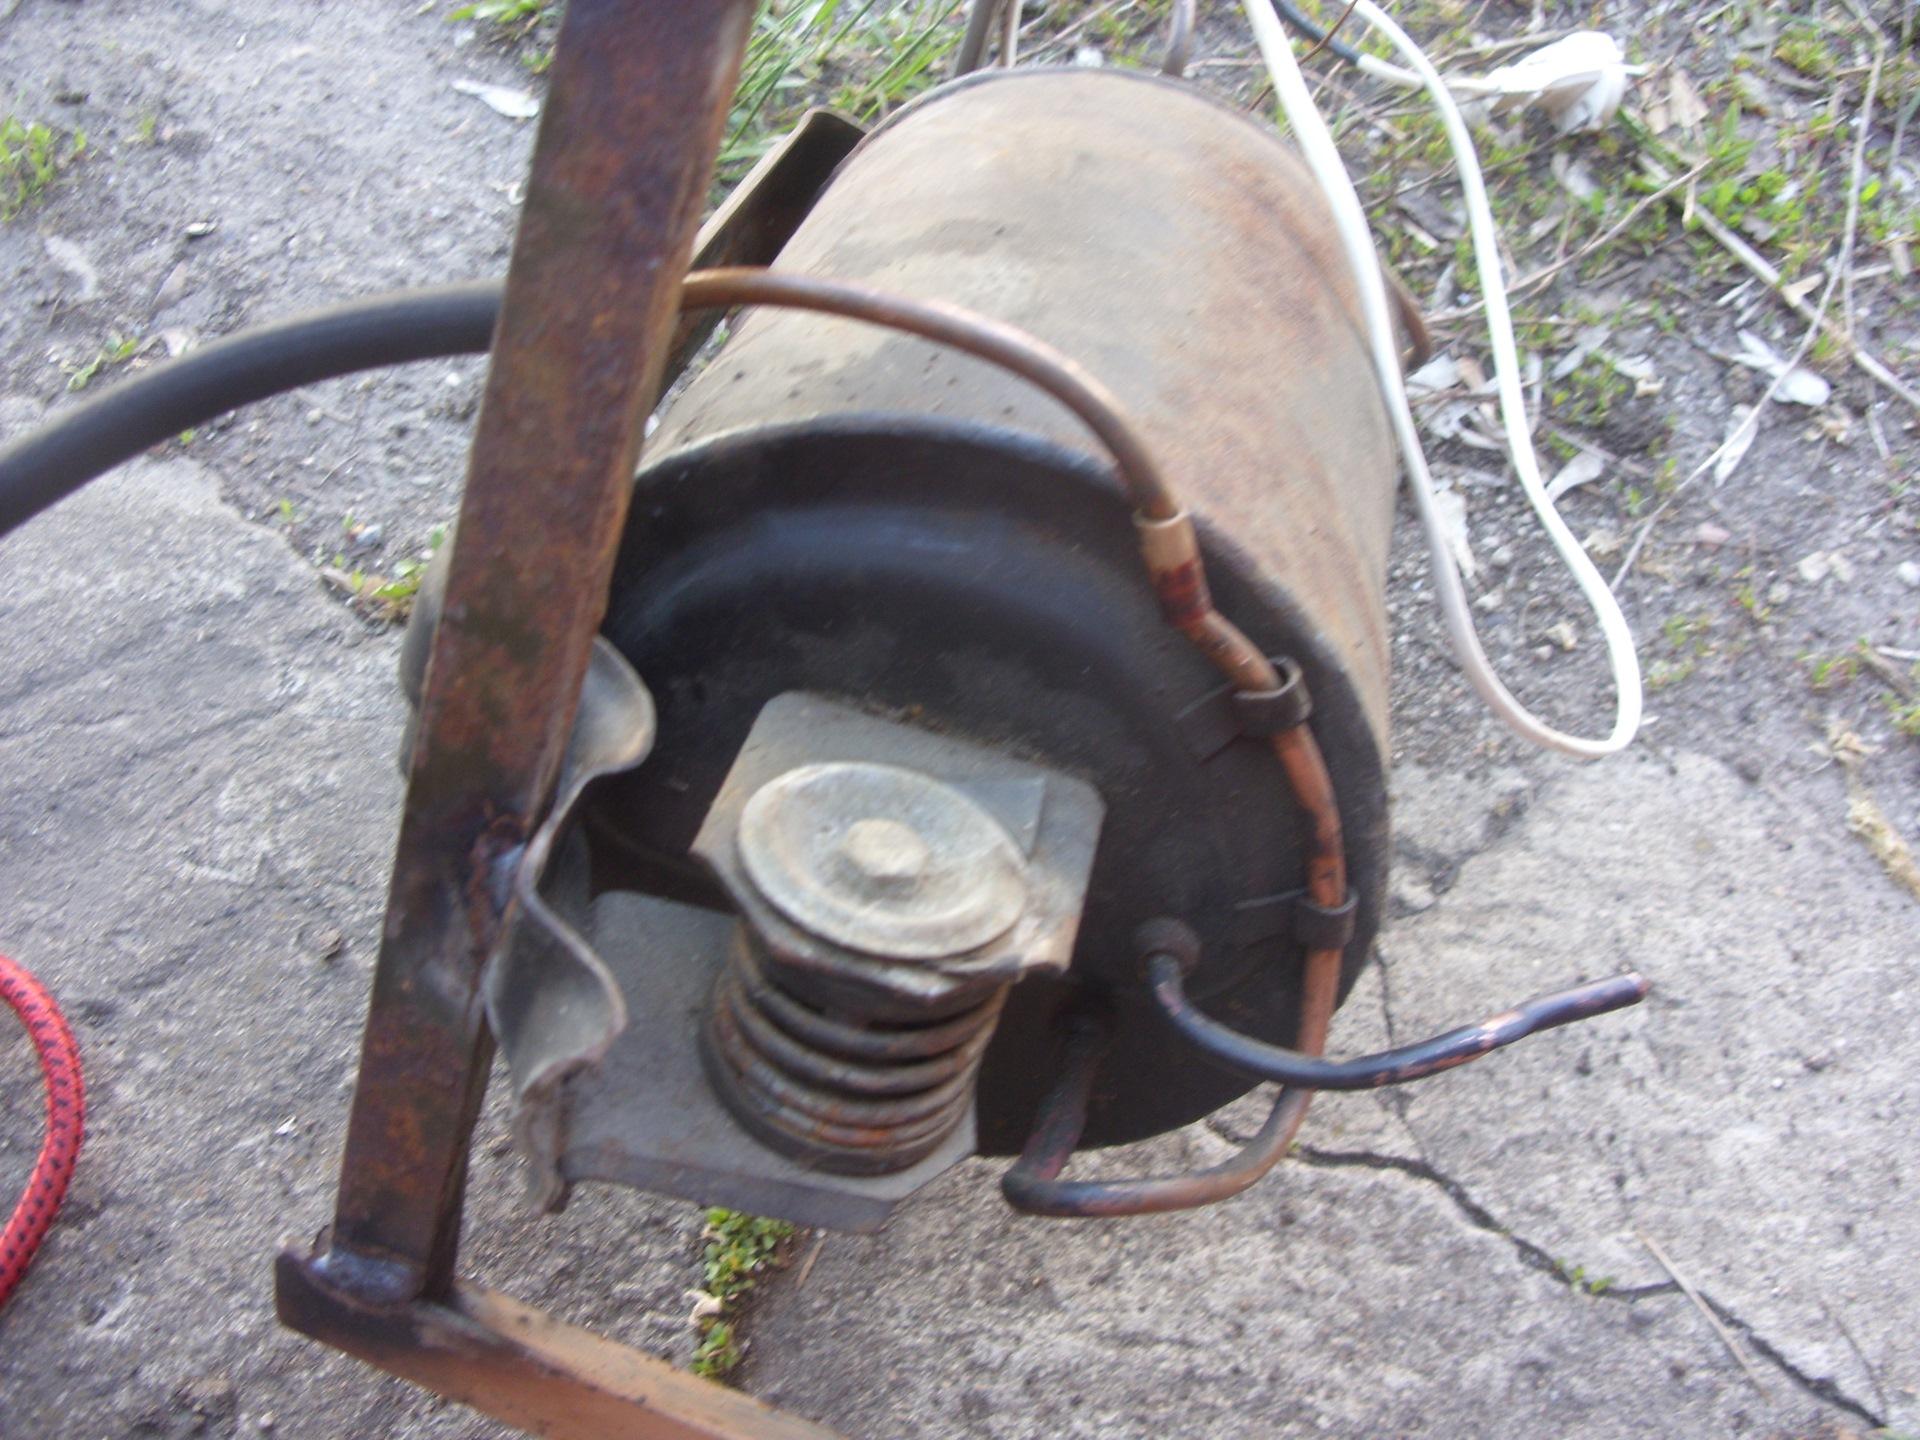 компрессор для накачки колес своими руками